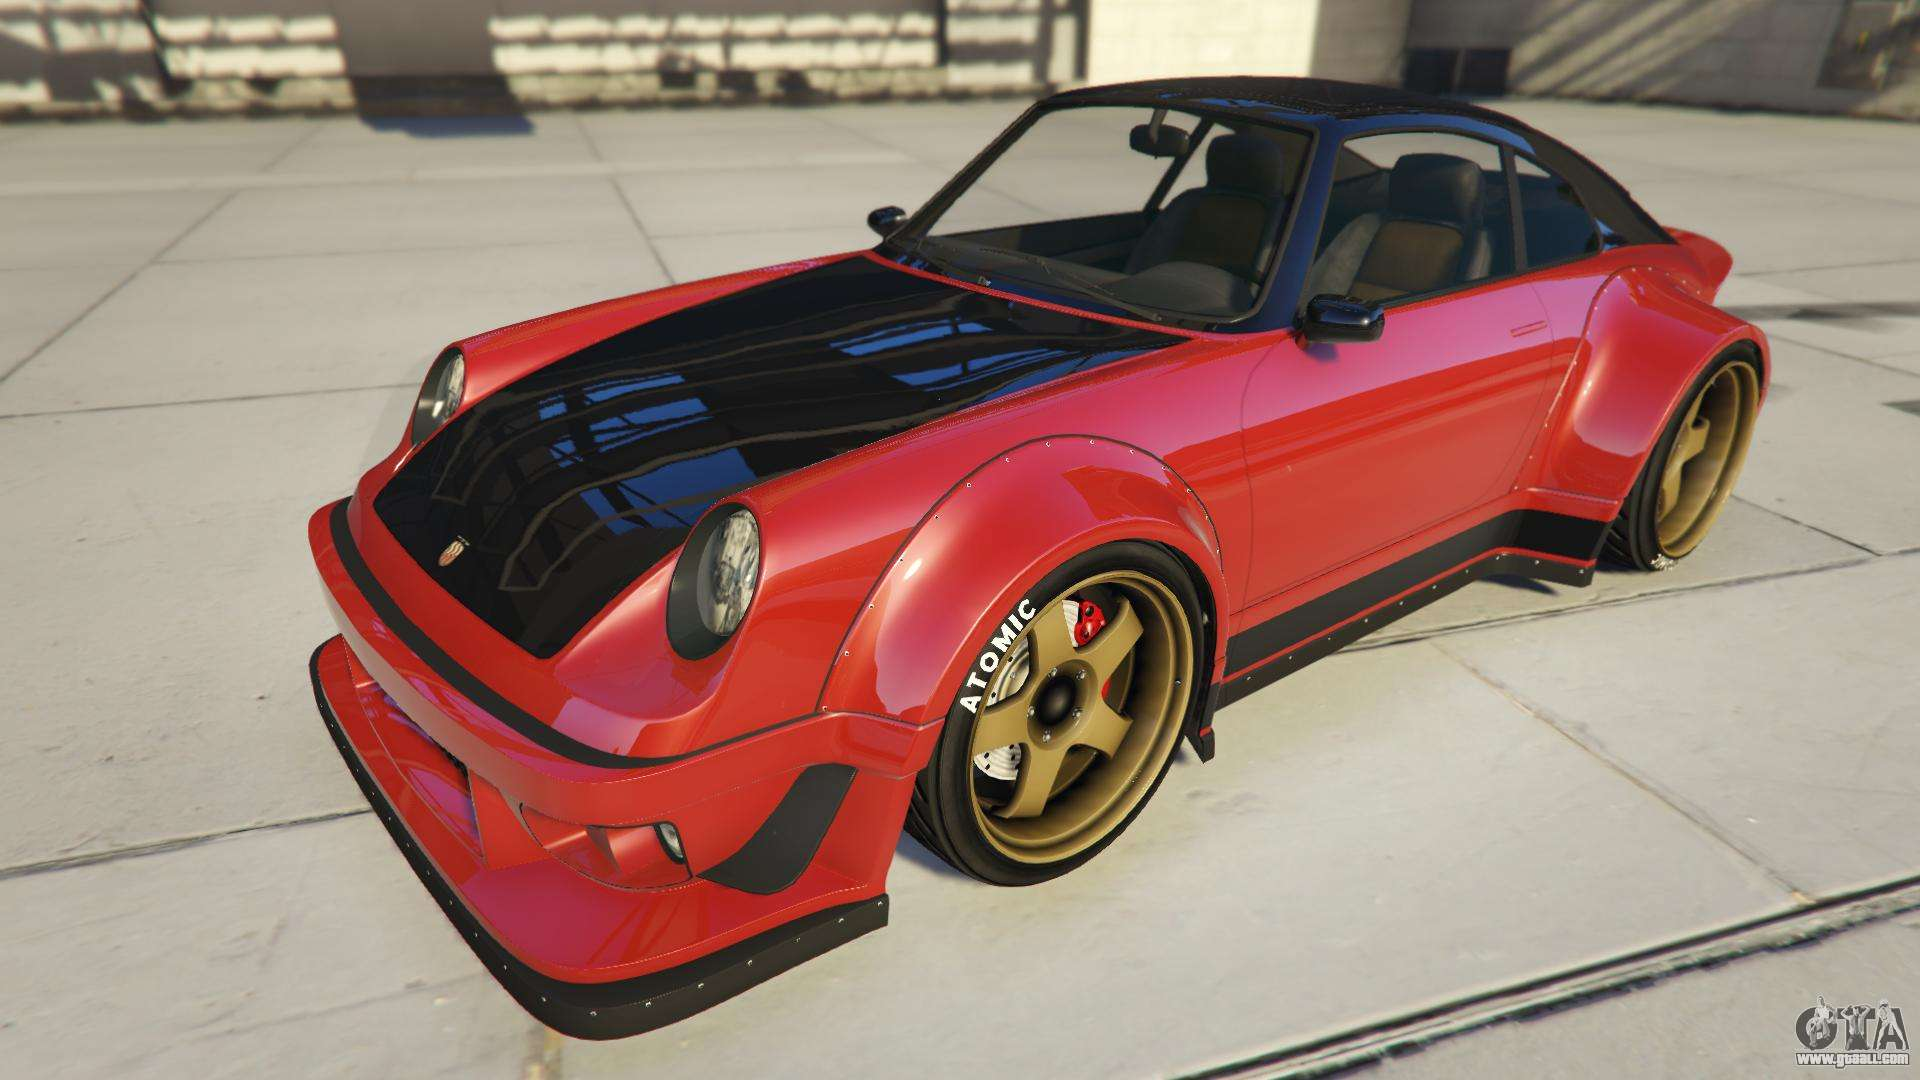 Pfister Comet Retro Custom from GTA Online